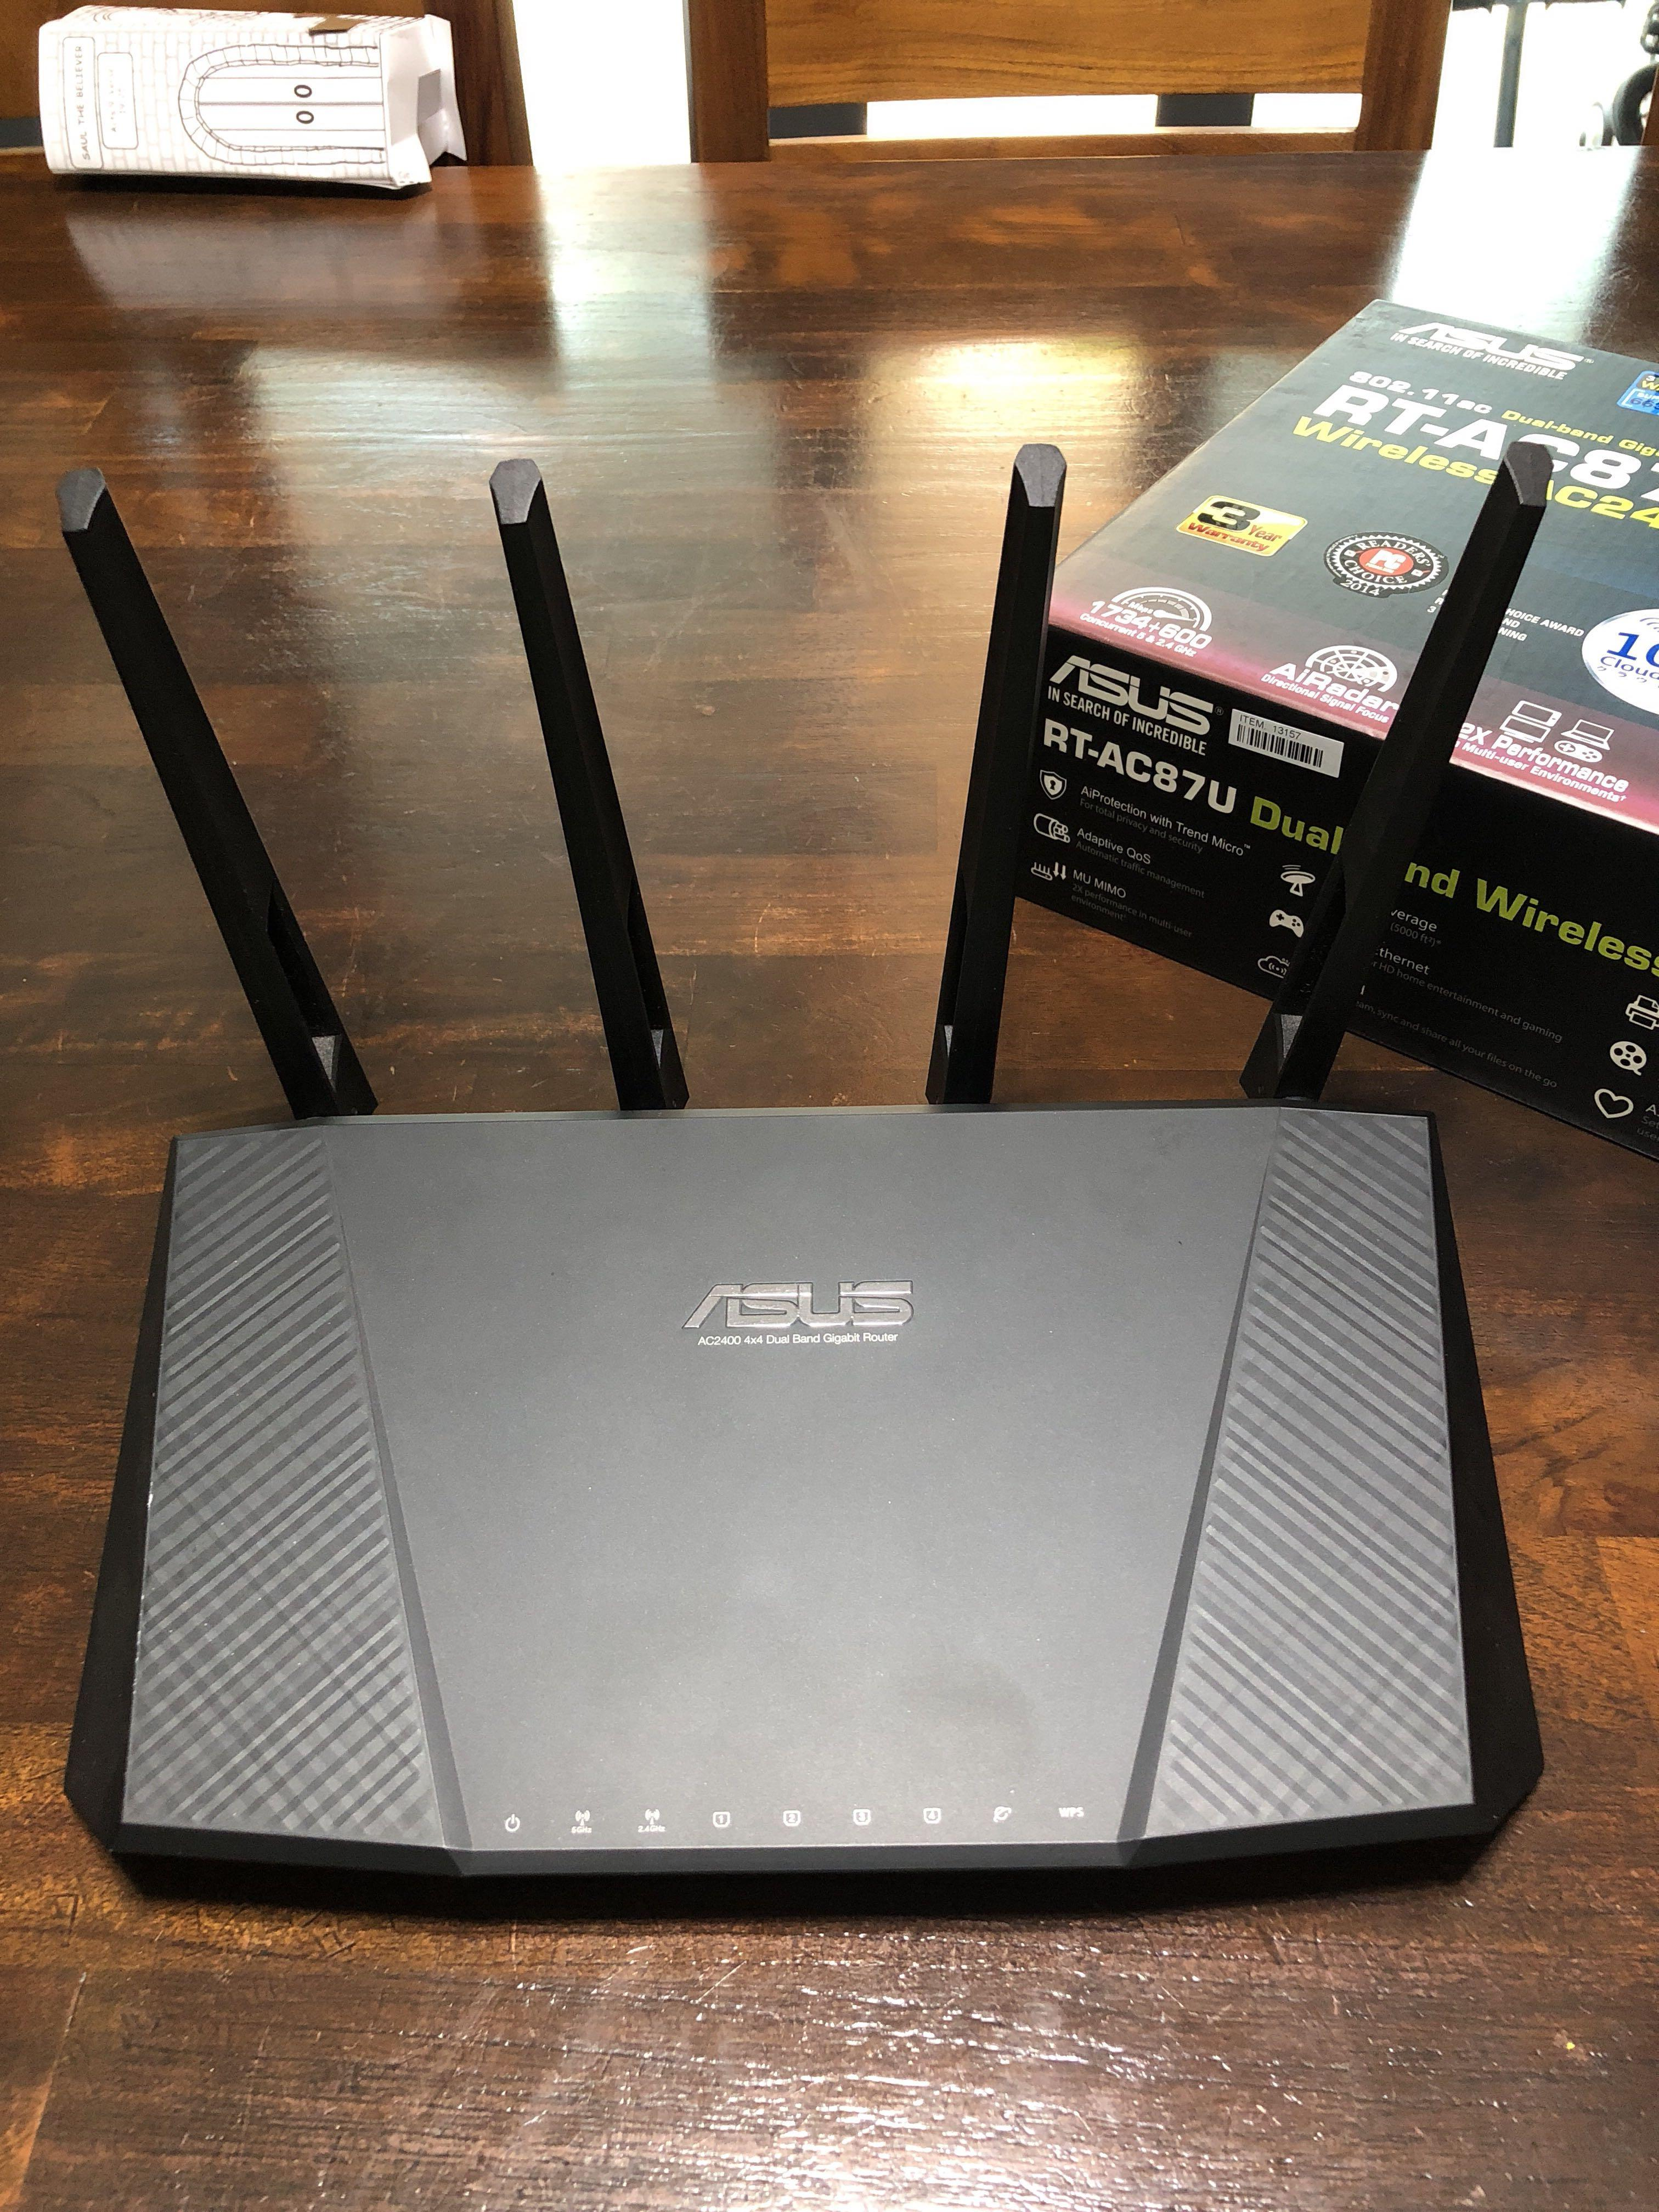 Asus dual band wireless router AC2400 RT-AC87U, Electronics